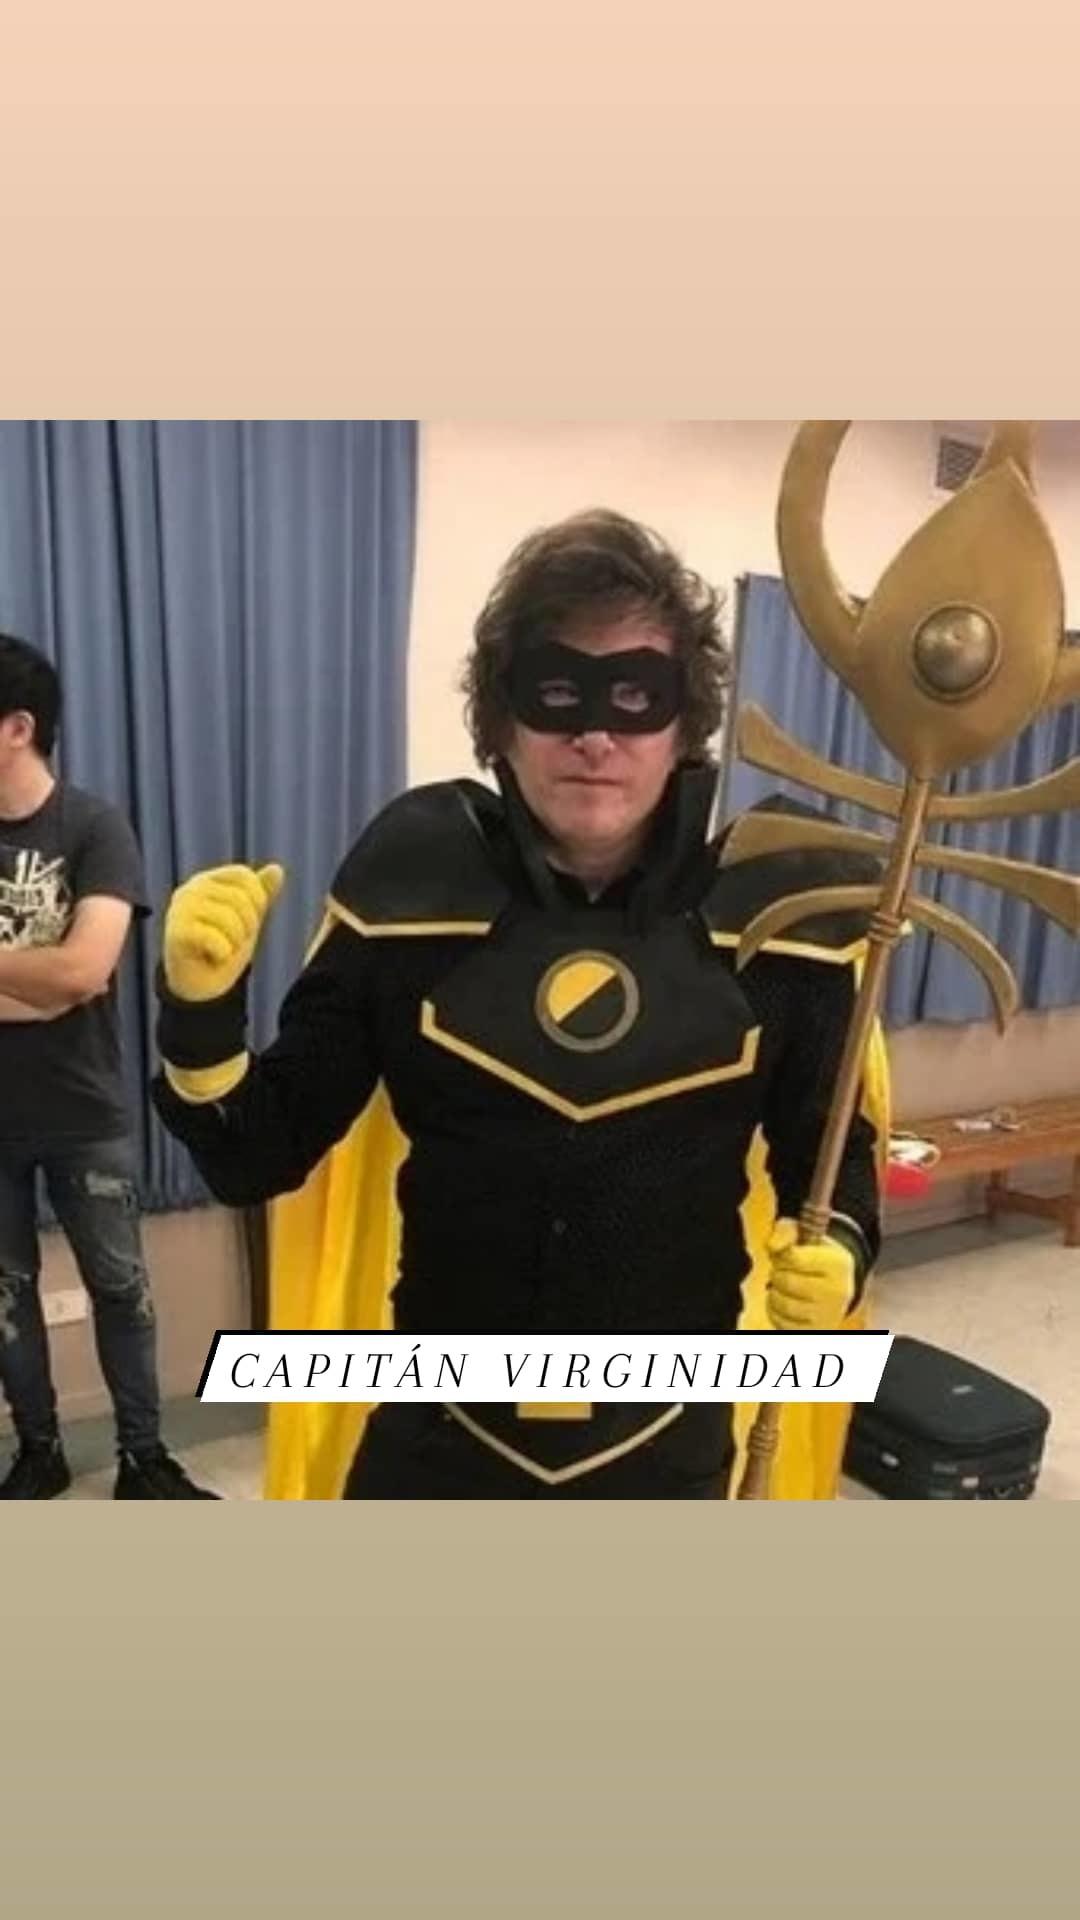 Capitán virginidad - meme